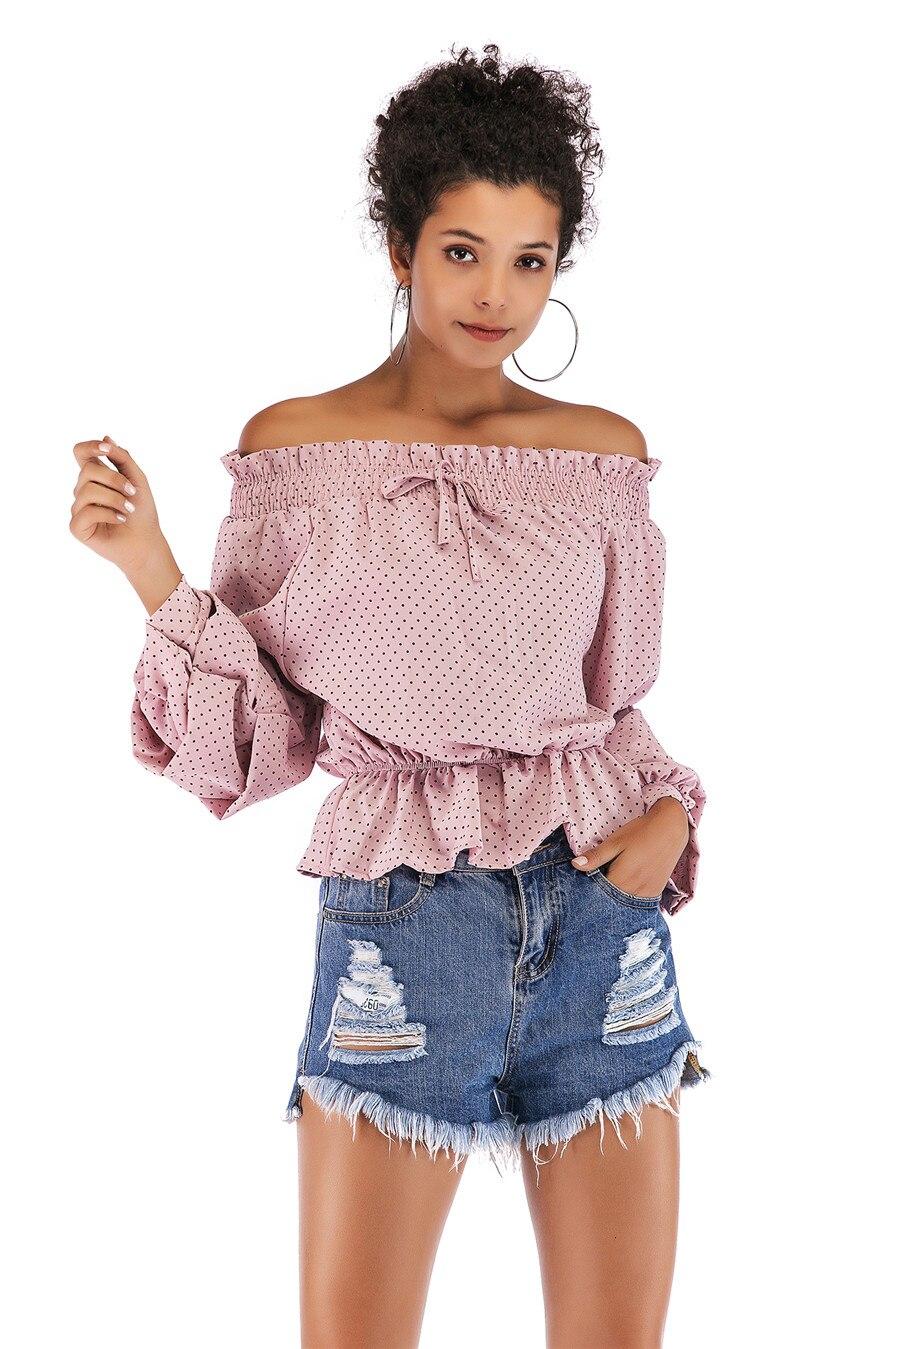 Gladiolus Chiffon Blouse Women 2019 Spring Autumn Long Sleeve Polka Dot Off Shoulder Sexy Blouses Women Shirts Ruffles Blusas (29)